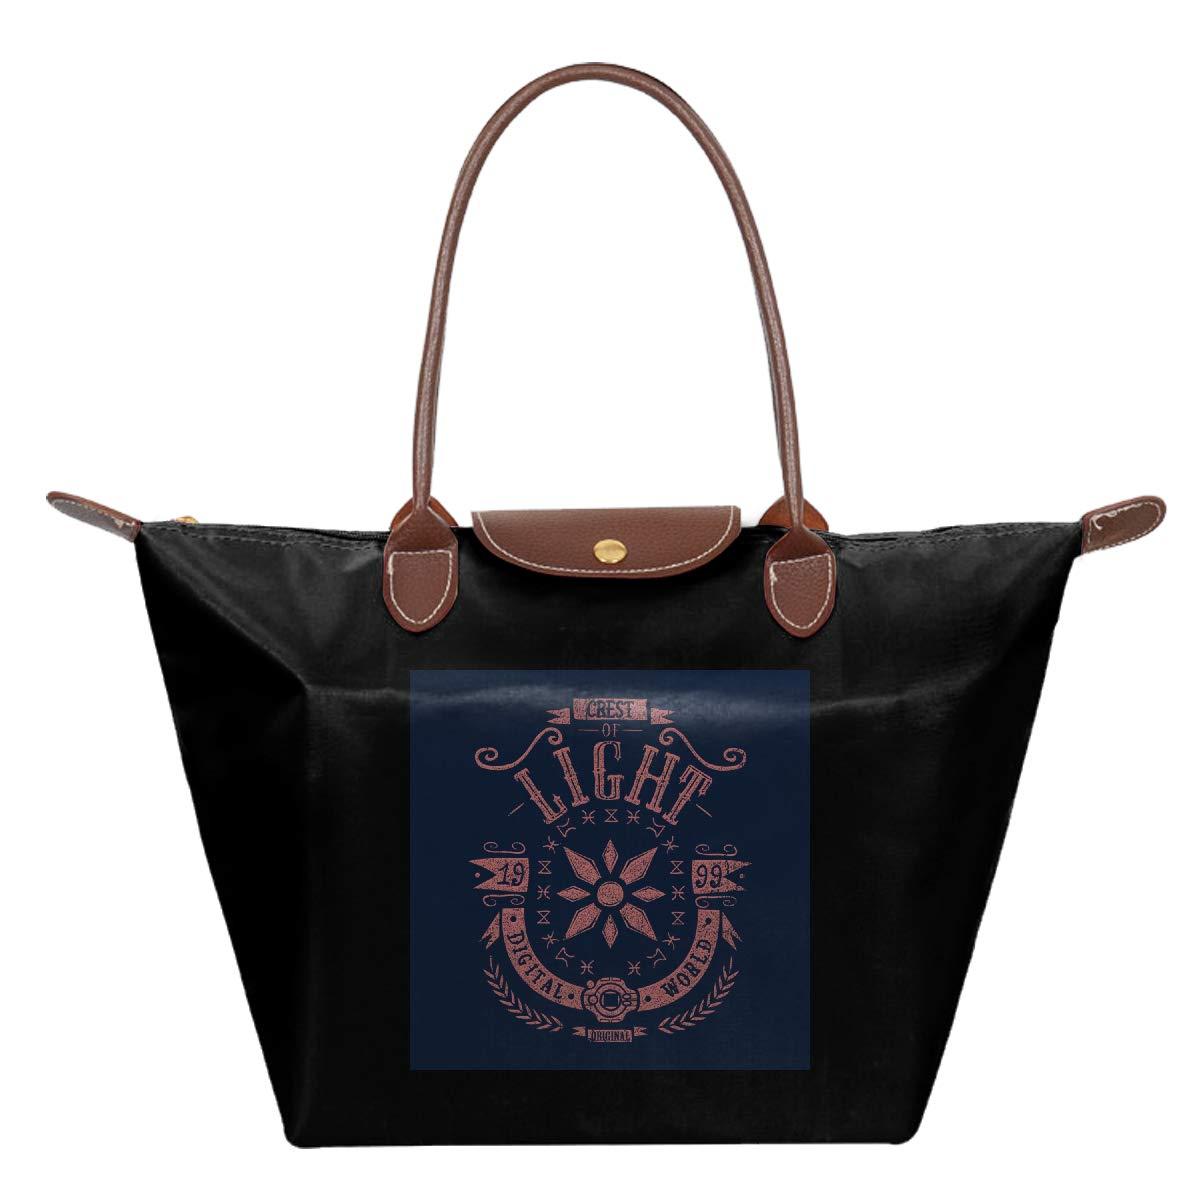 Dig-imon Crest Of Light Waterproof Leather Folded Messenger Nylon Bag Travel Tote Hopping Folding School Handbags